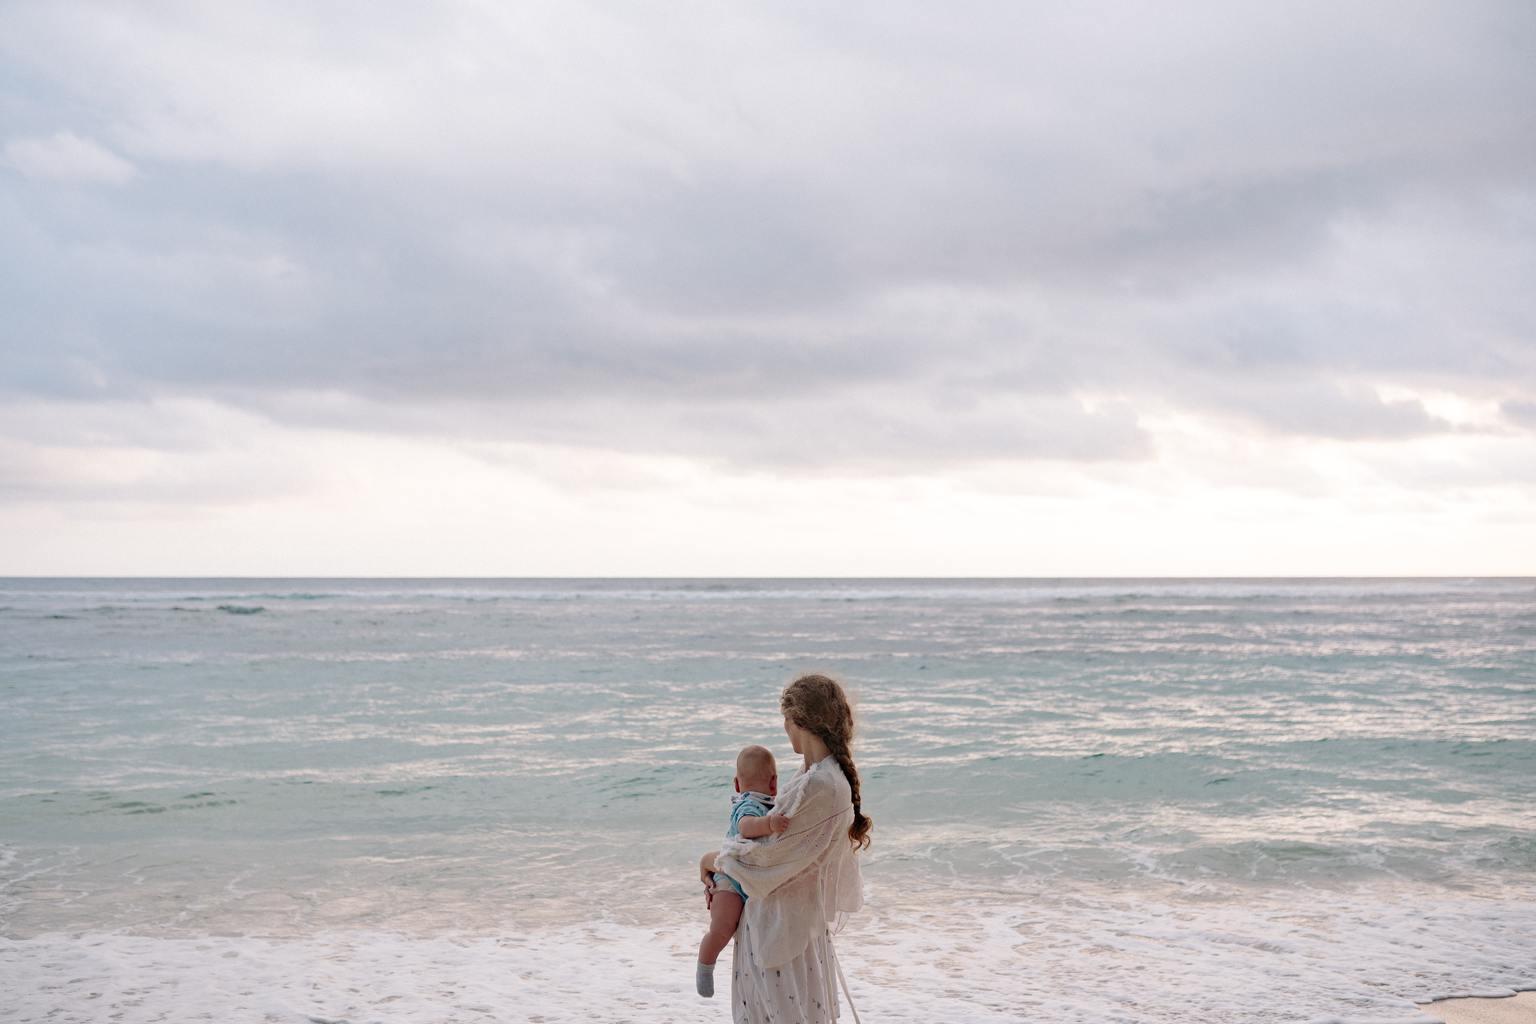 playa babé fotografía madre